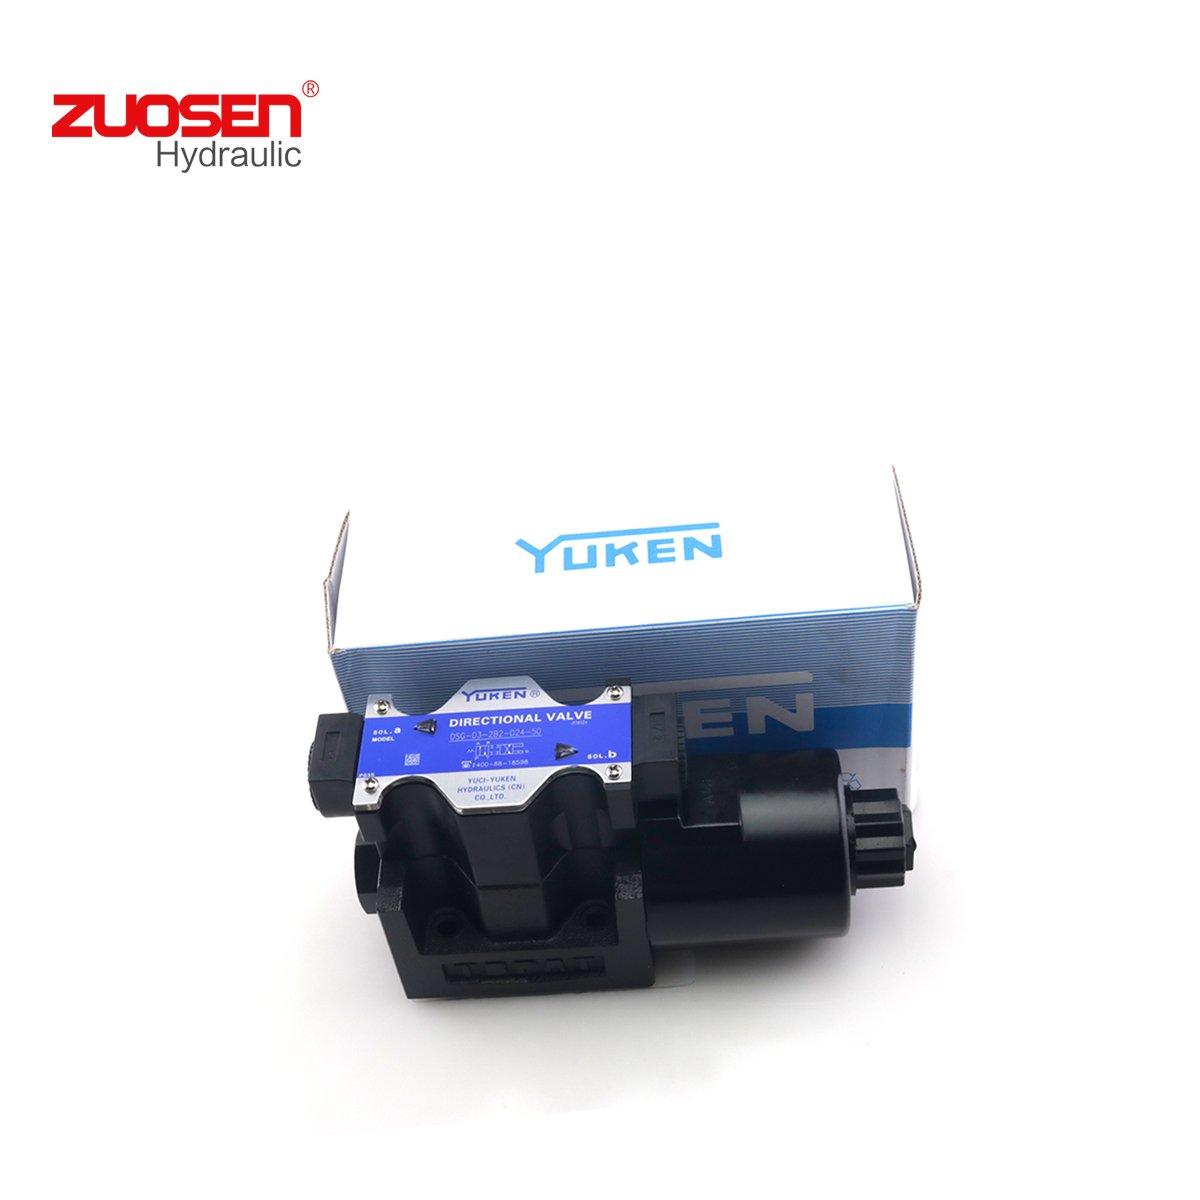 Yuken DSG-03-2B2-D24-50 Hydraulic Valves